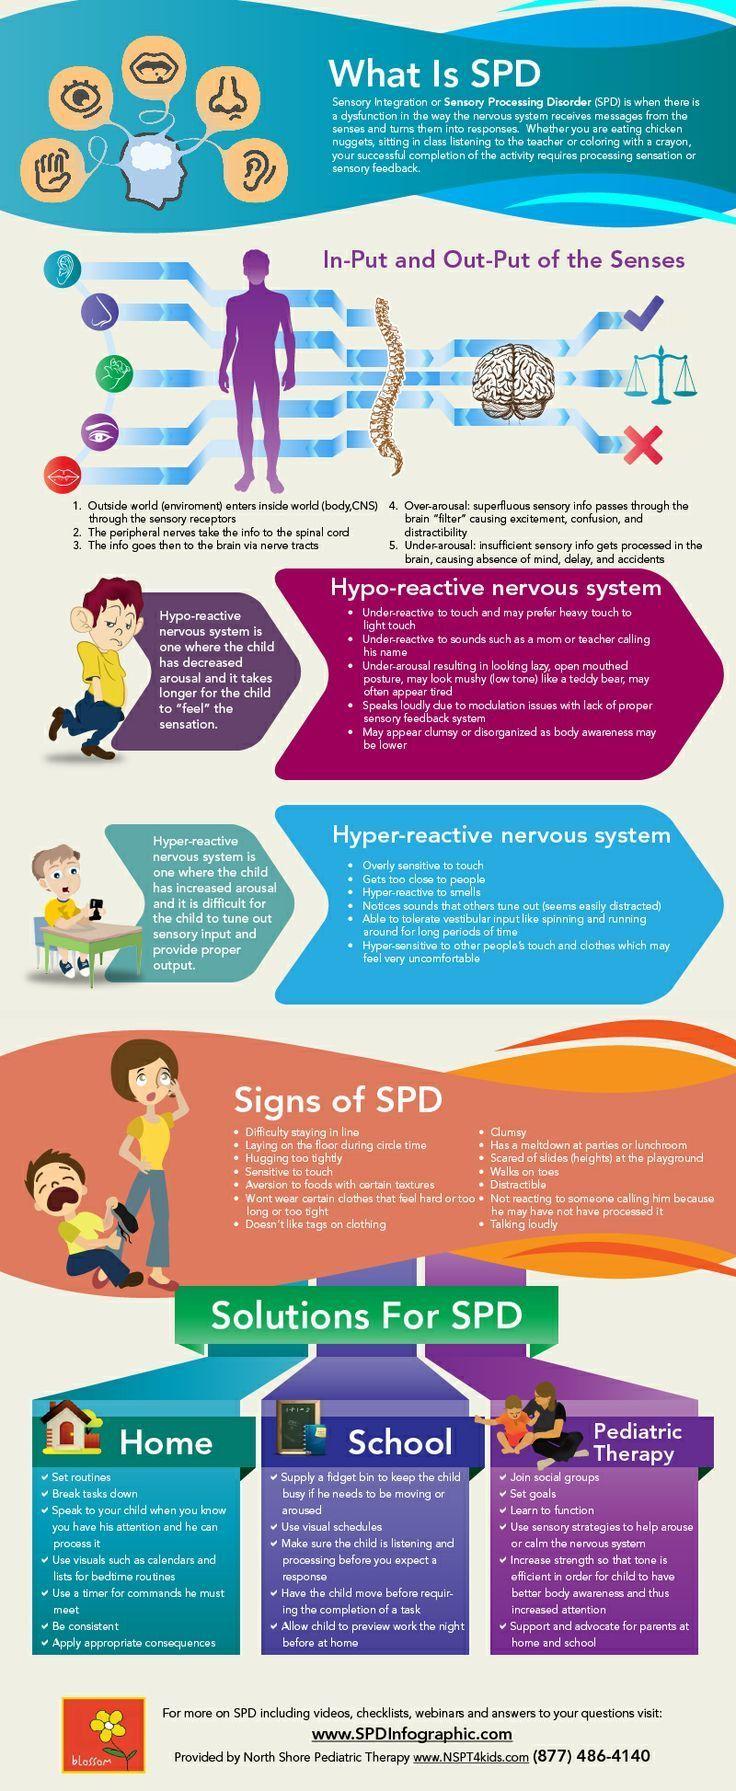 North Shore Pediatric Provides Resource for Sensory Processing Disorders | ilslearningcorner.com